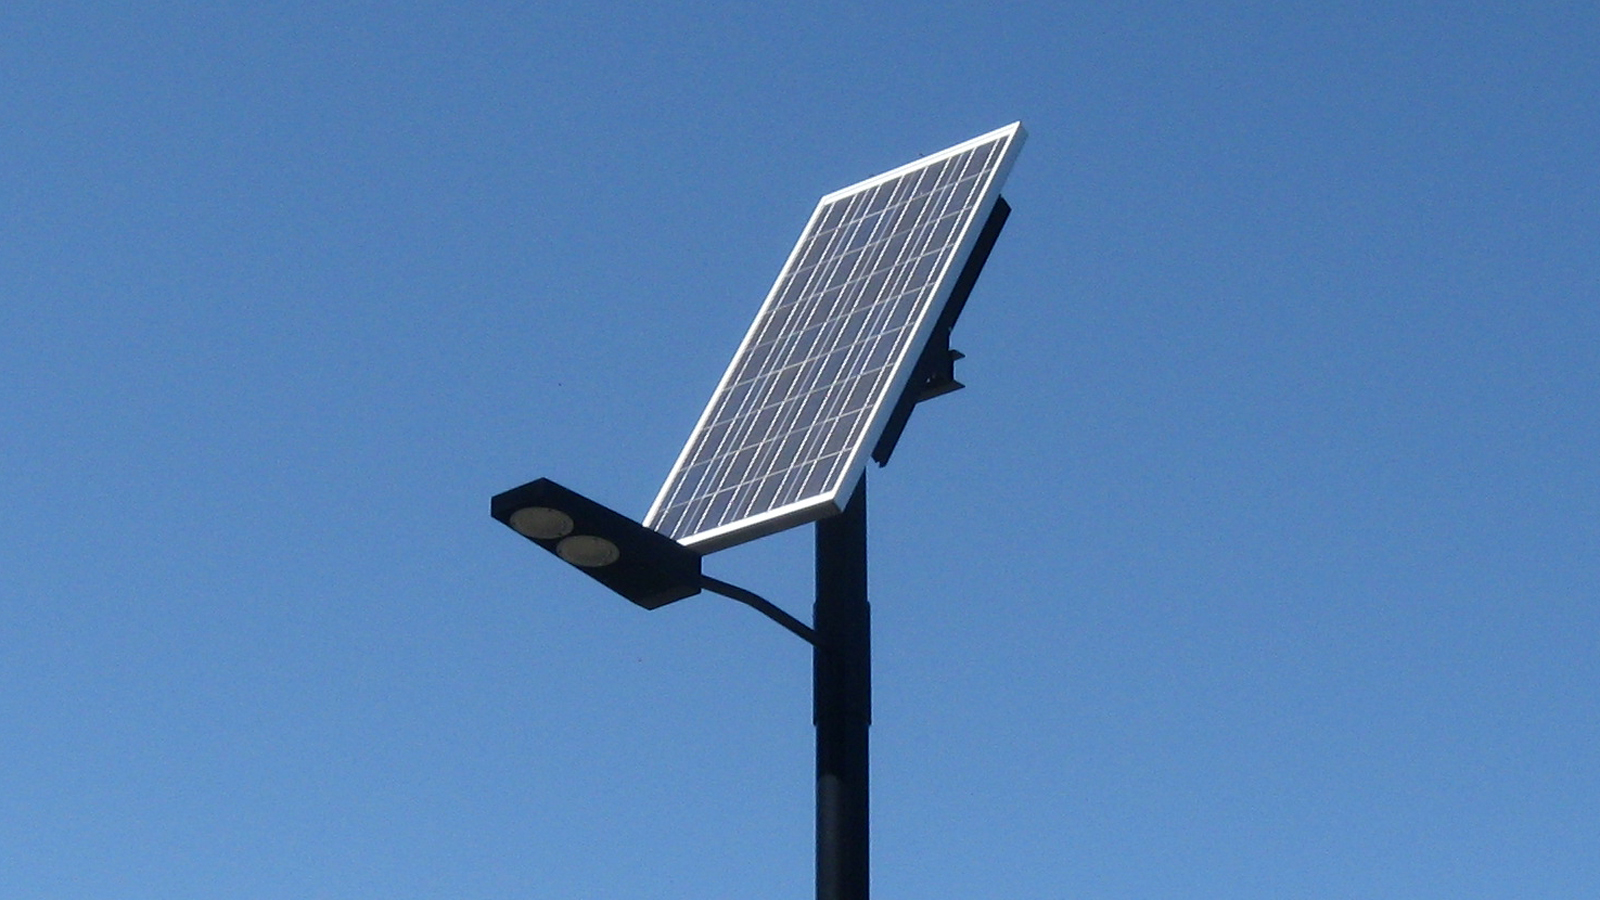 Прожекторы на солнечных батареях